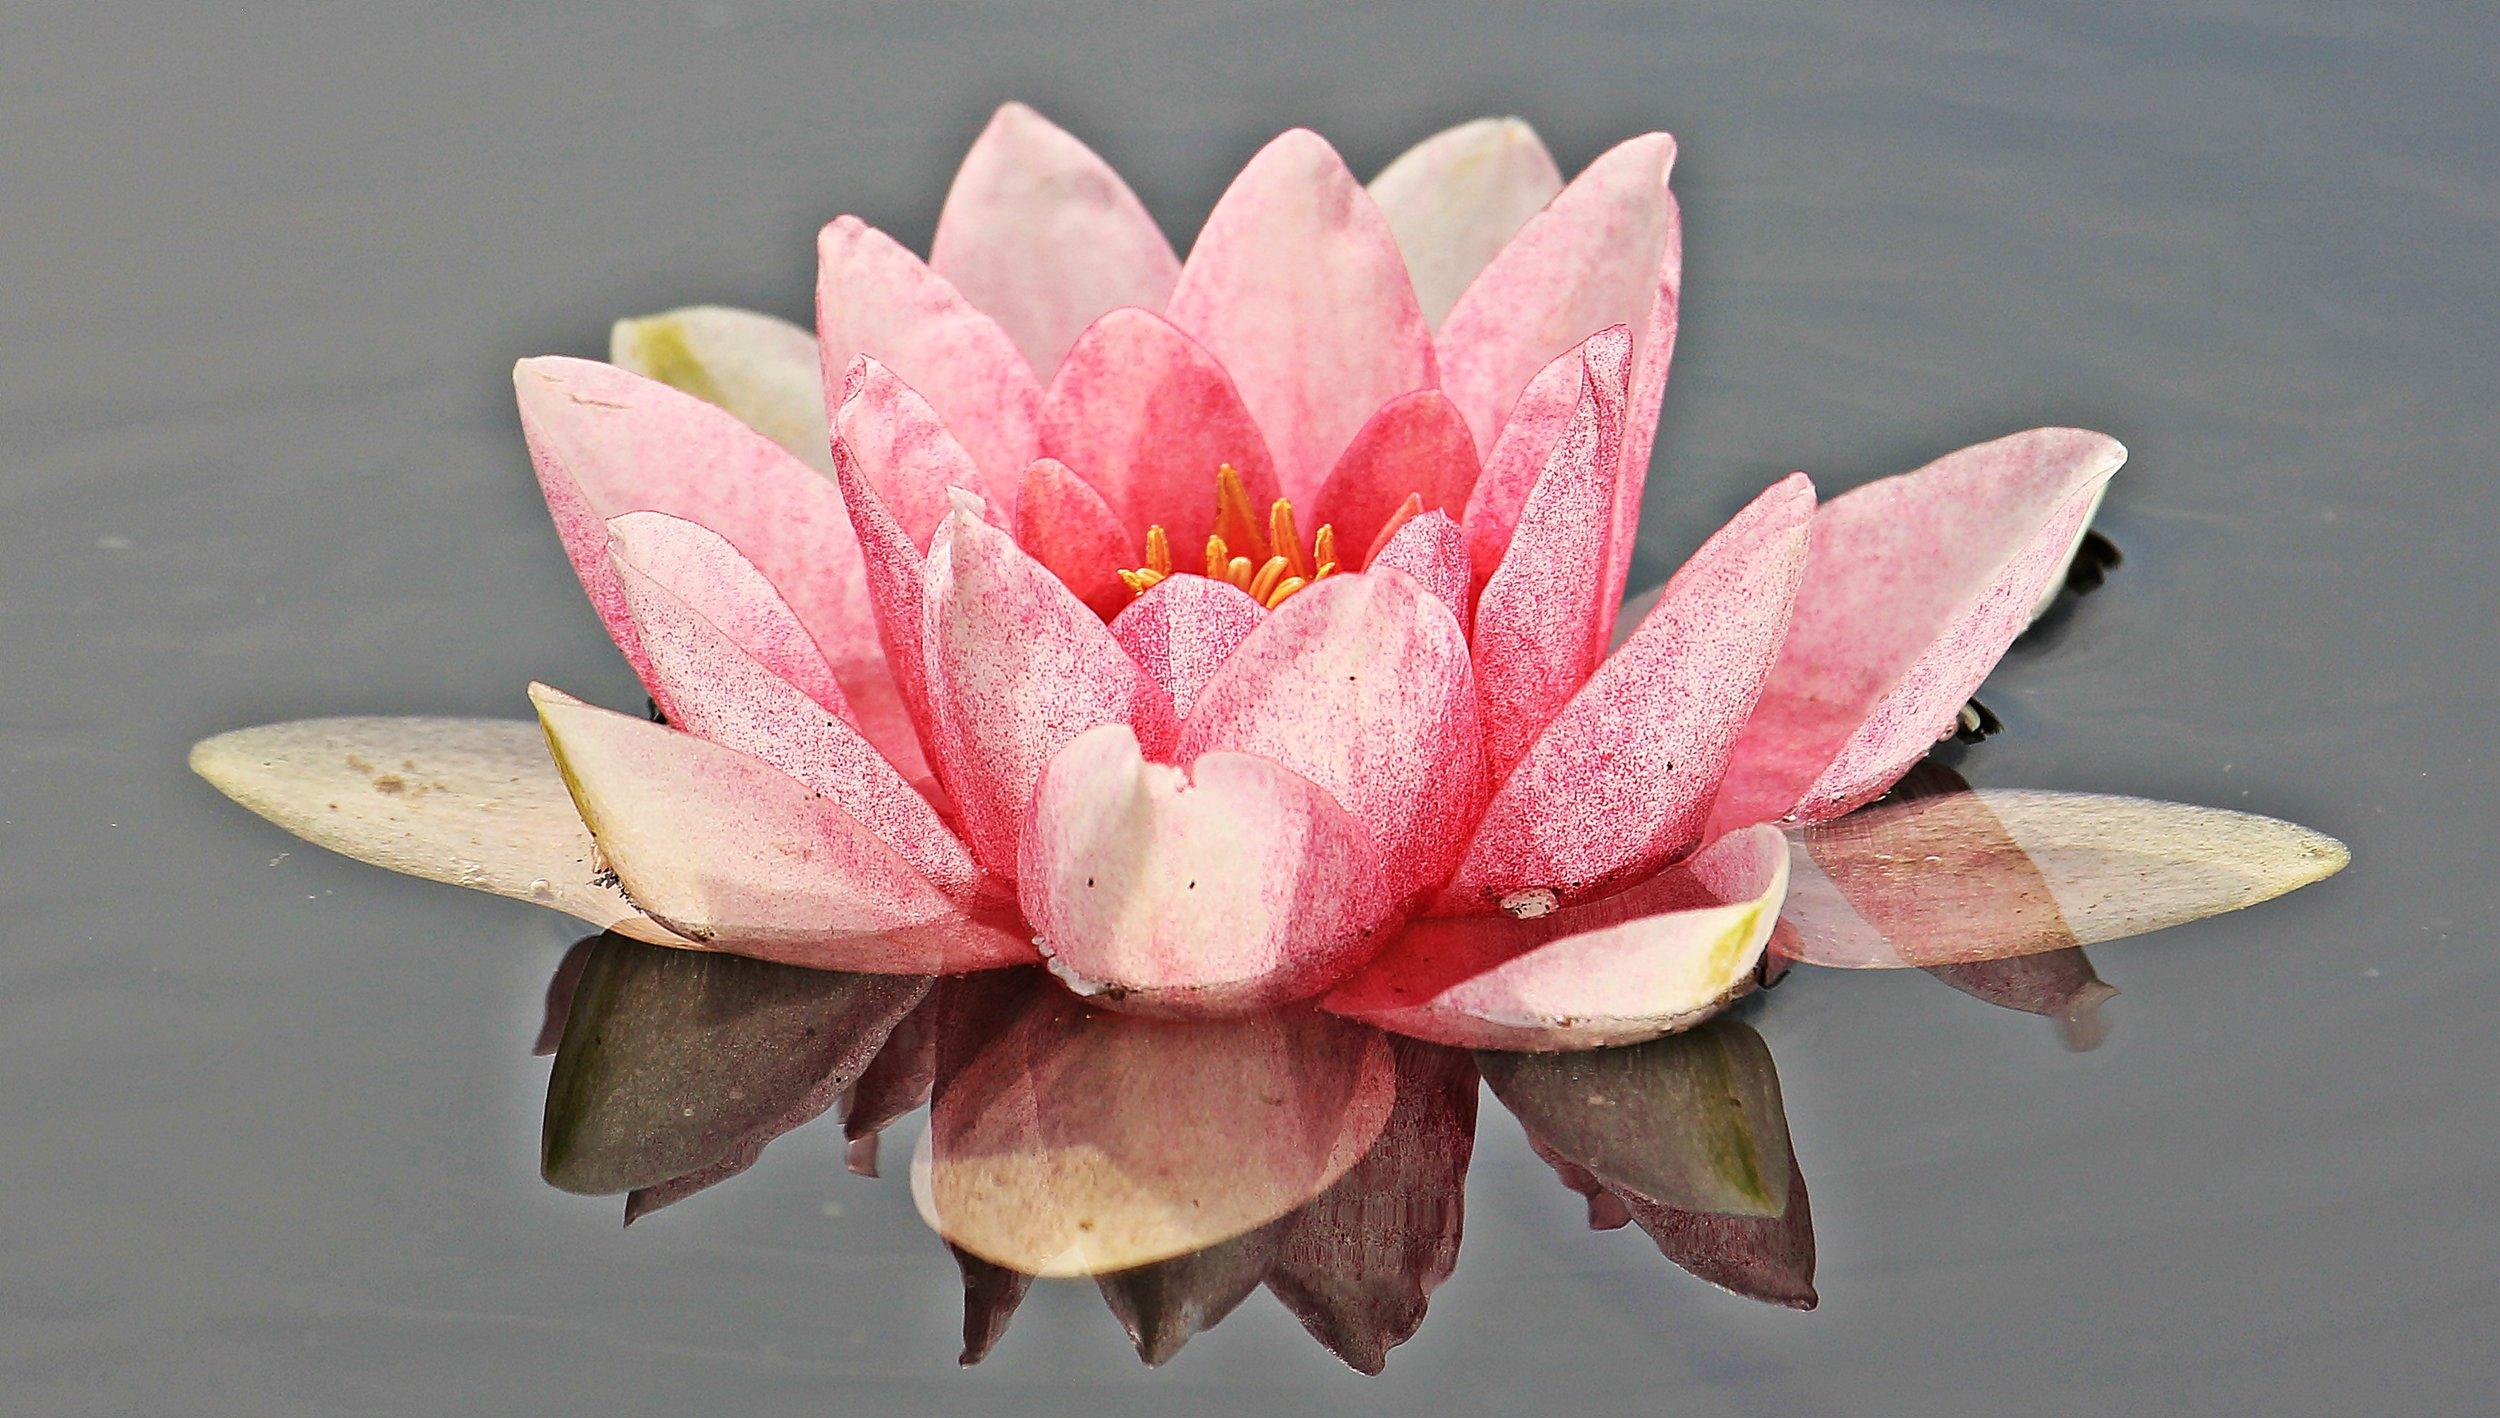 water-lily-nuphar-lutea-aquatic-plant-mirroring-158567.jpeg